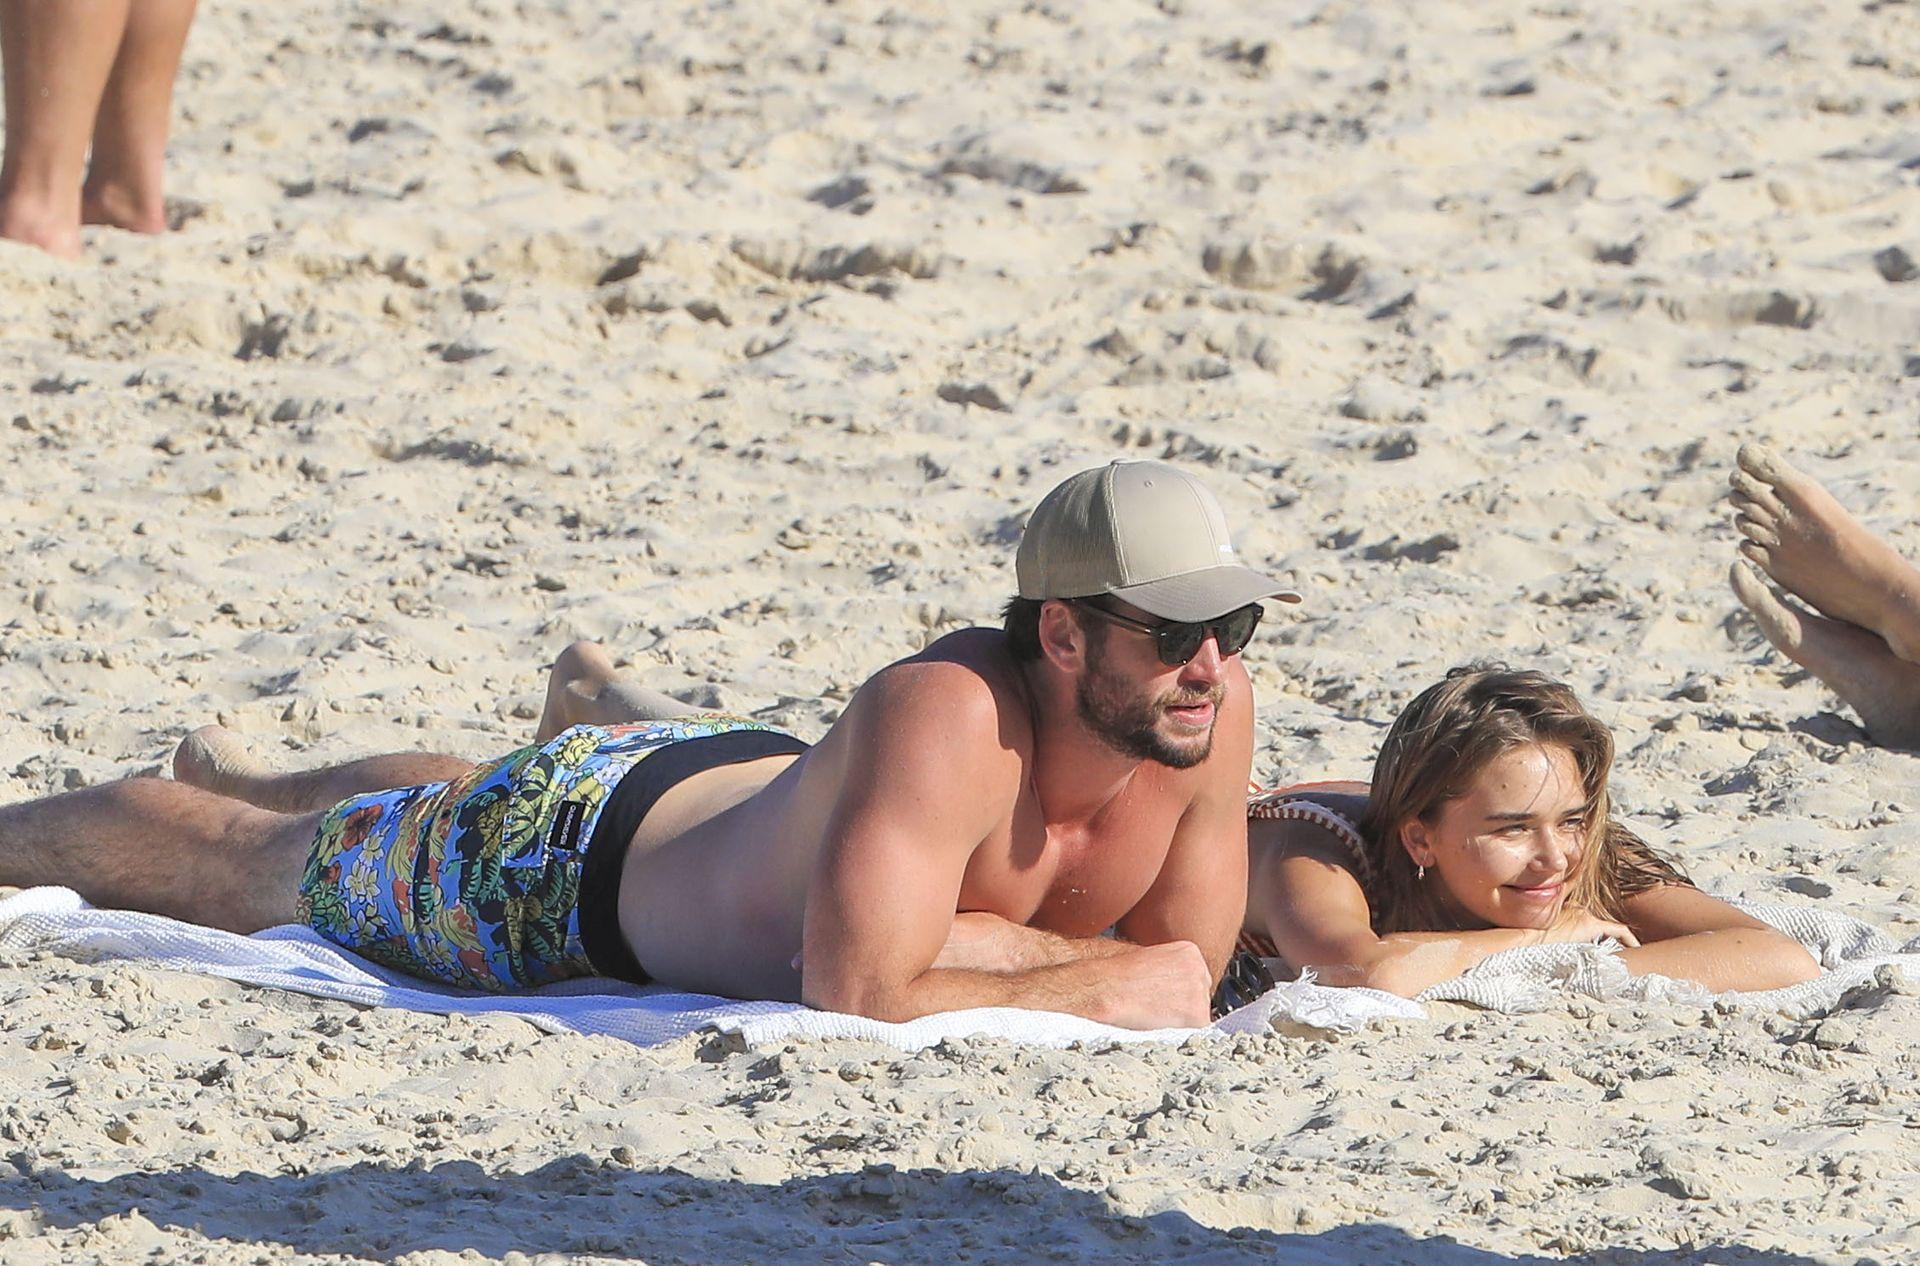 Gabriella Brooks Hot – Liam Hemsworth's New Girlfriend 0019